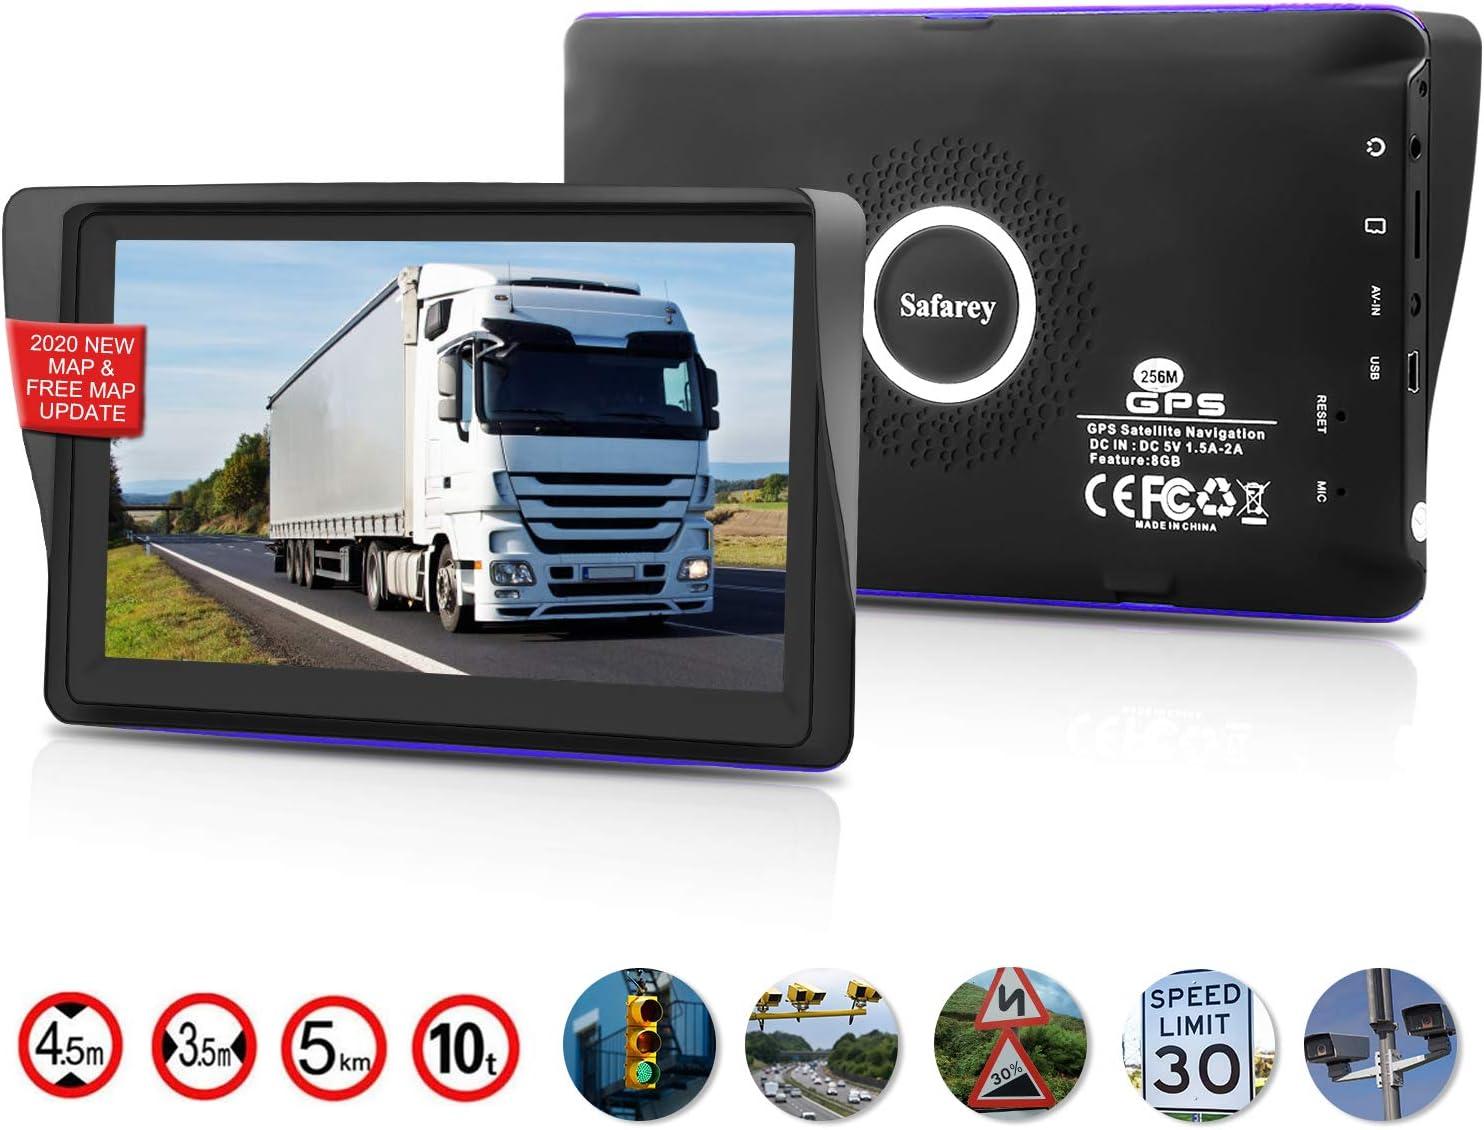 GPS coches, 7 Pulgadas Navegadores GPS para Coche, Navegador gps para coche, pantalla táctil capacitiva de alto brillo, Actualización del mapa de por vida,Dirección de giro recordando voz real hablada